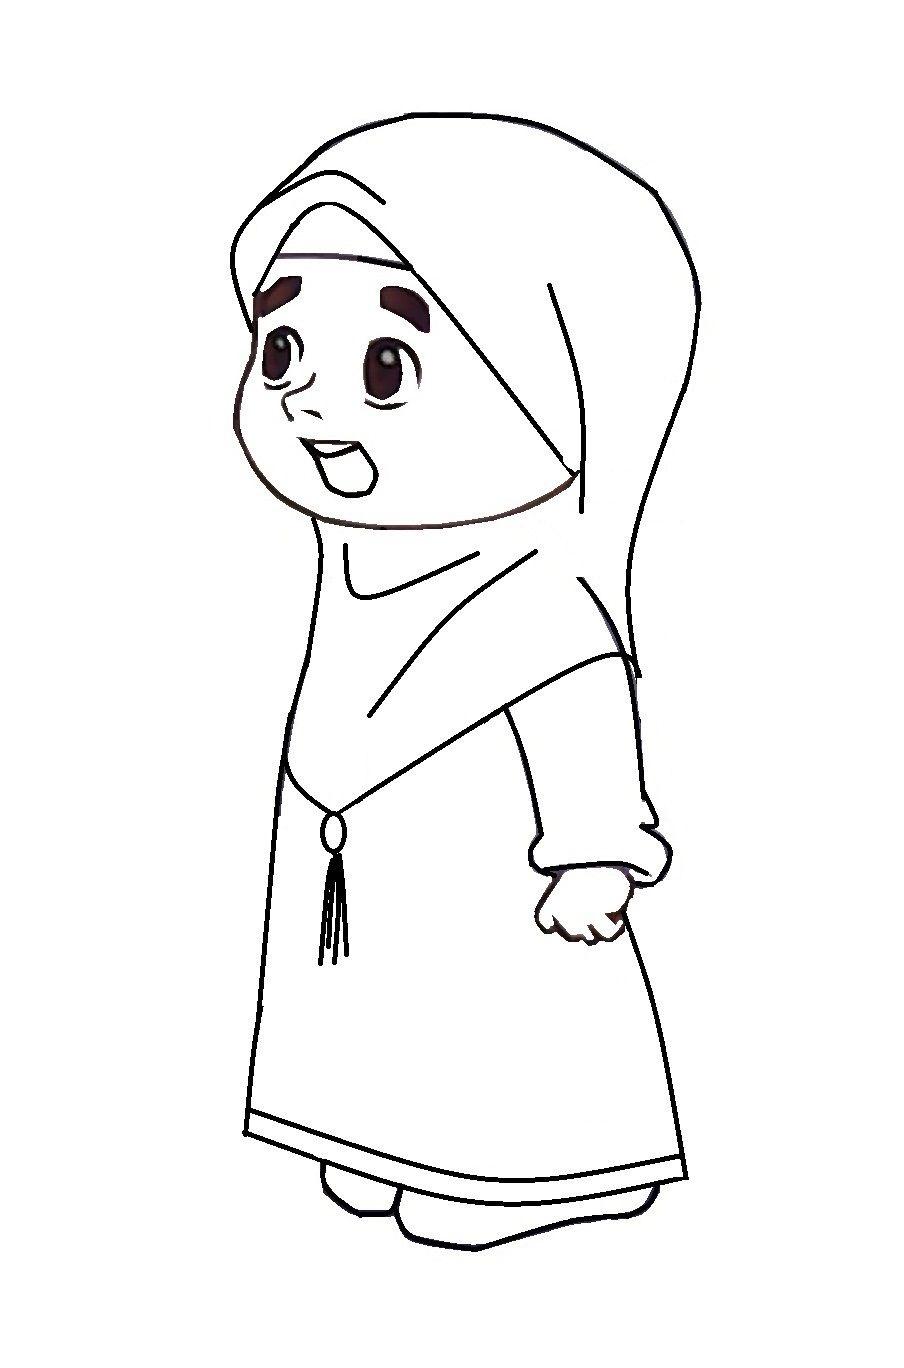 Gambar Mewarnai Gambar Anak Cita Dokter 2 Kartun Muslimah Diwarna